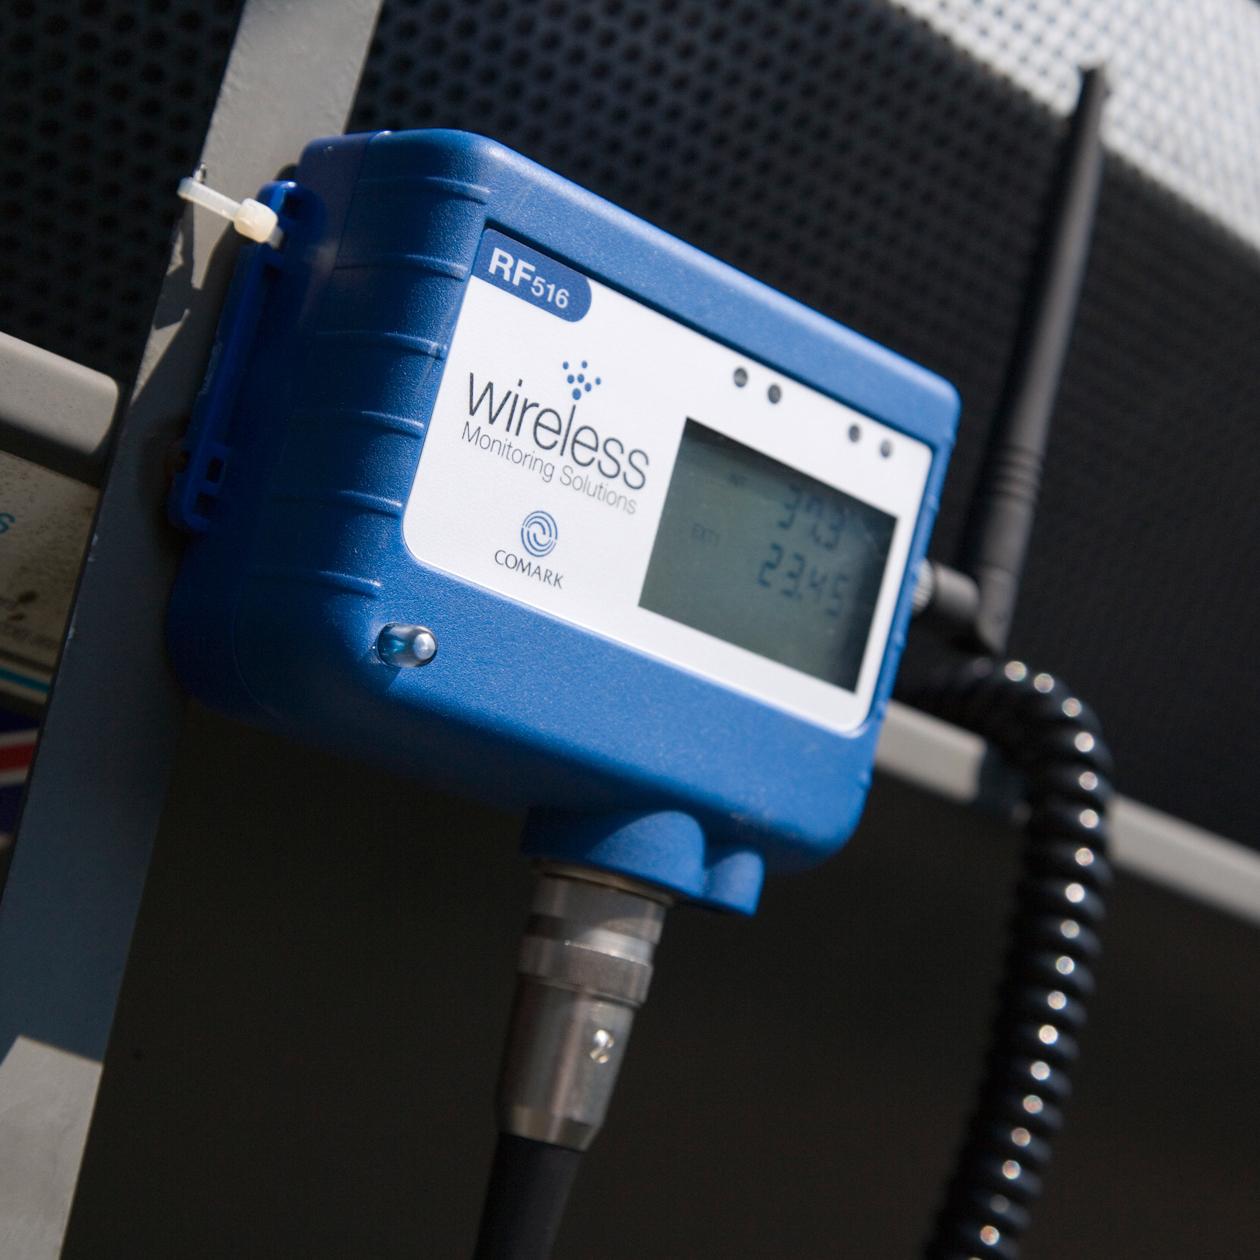 RF516 PT100 Wireless Temperature Transmitter - Comark